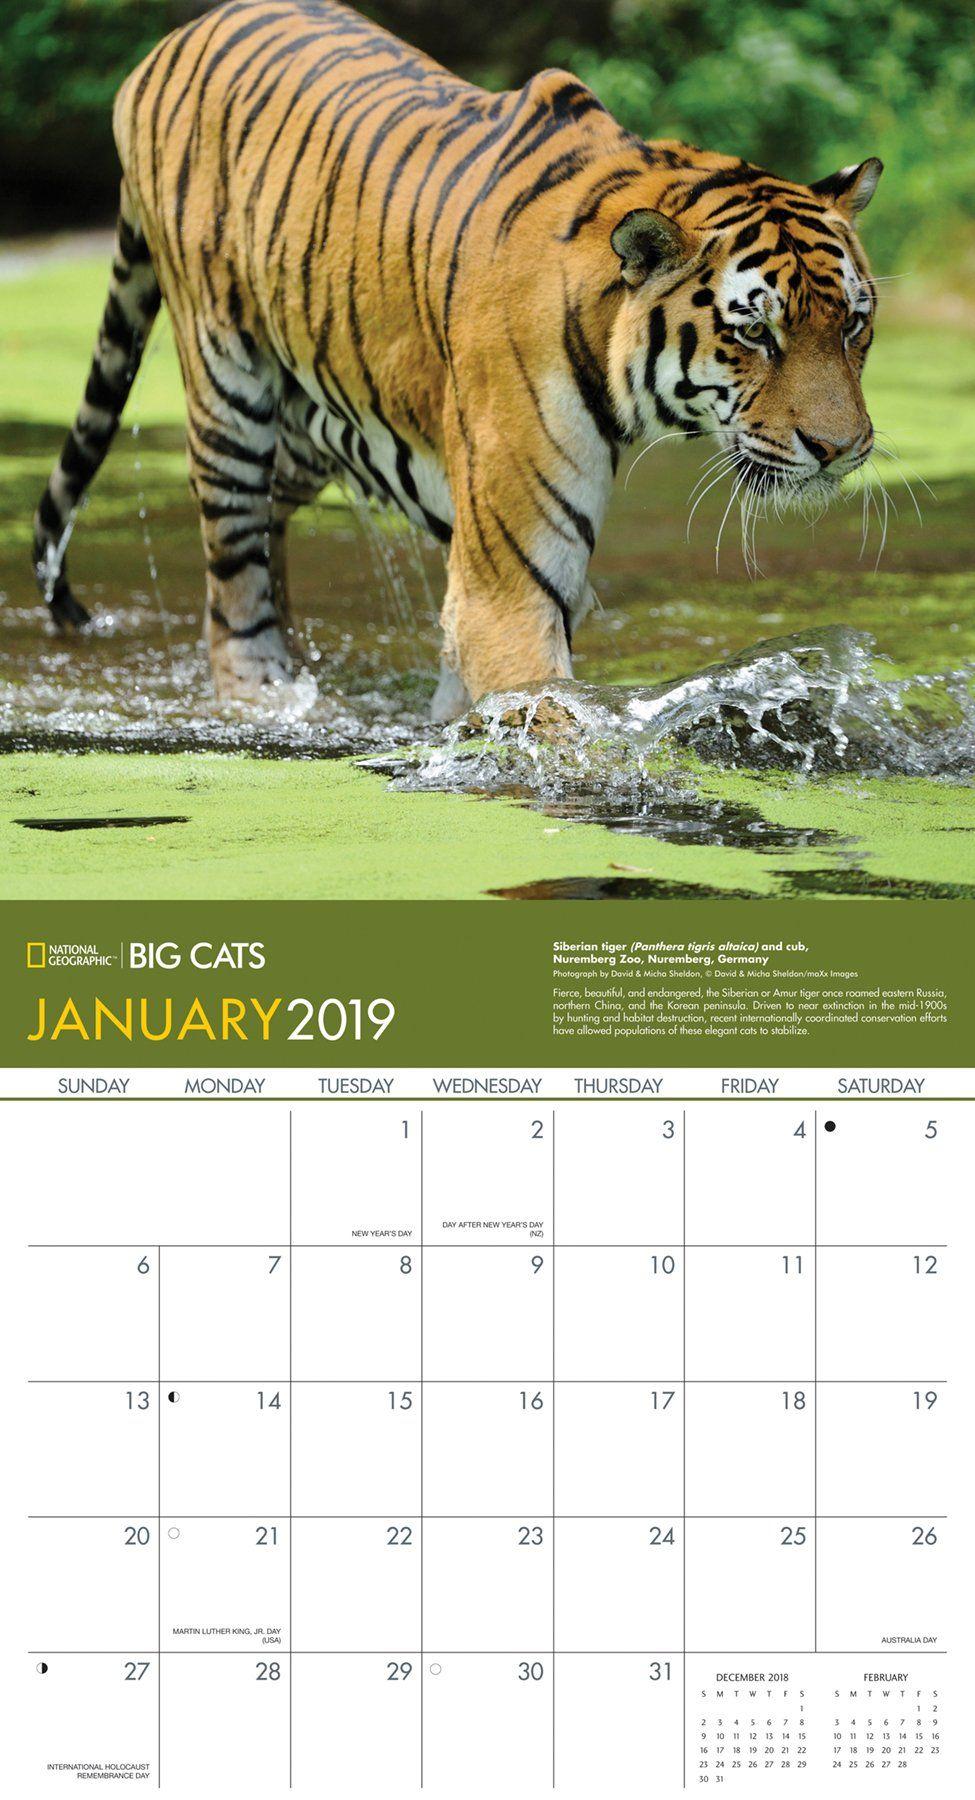 National Geographic Big Cats 2019 Wall Calendar Calendar